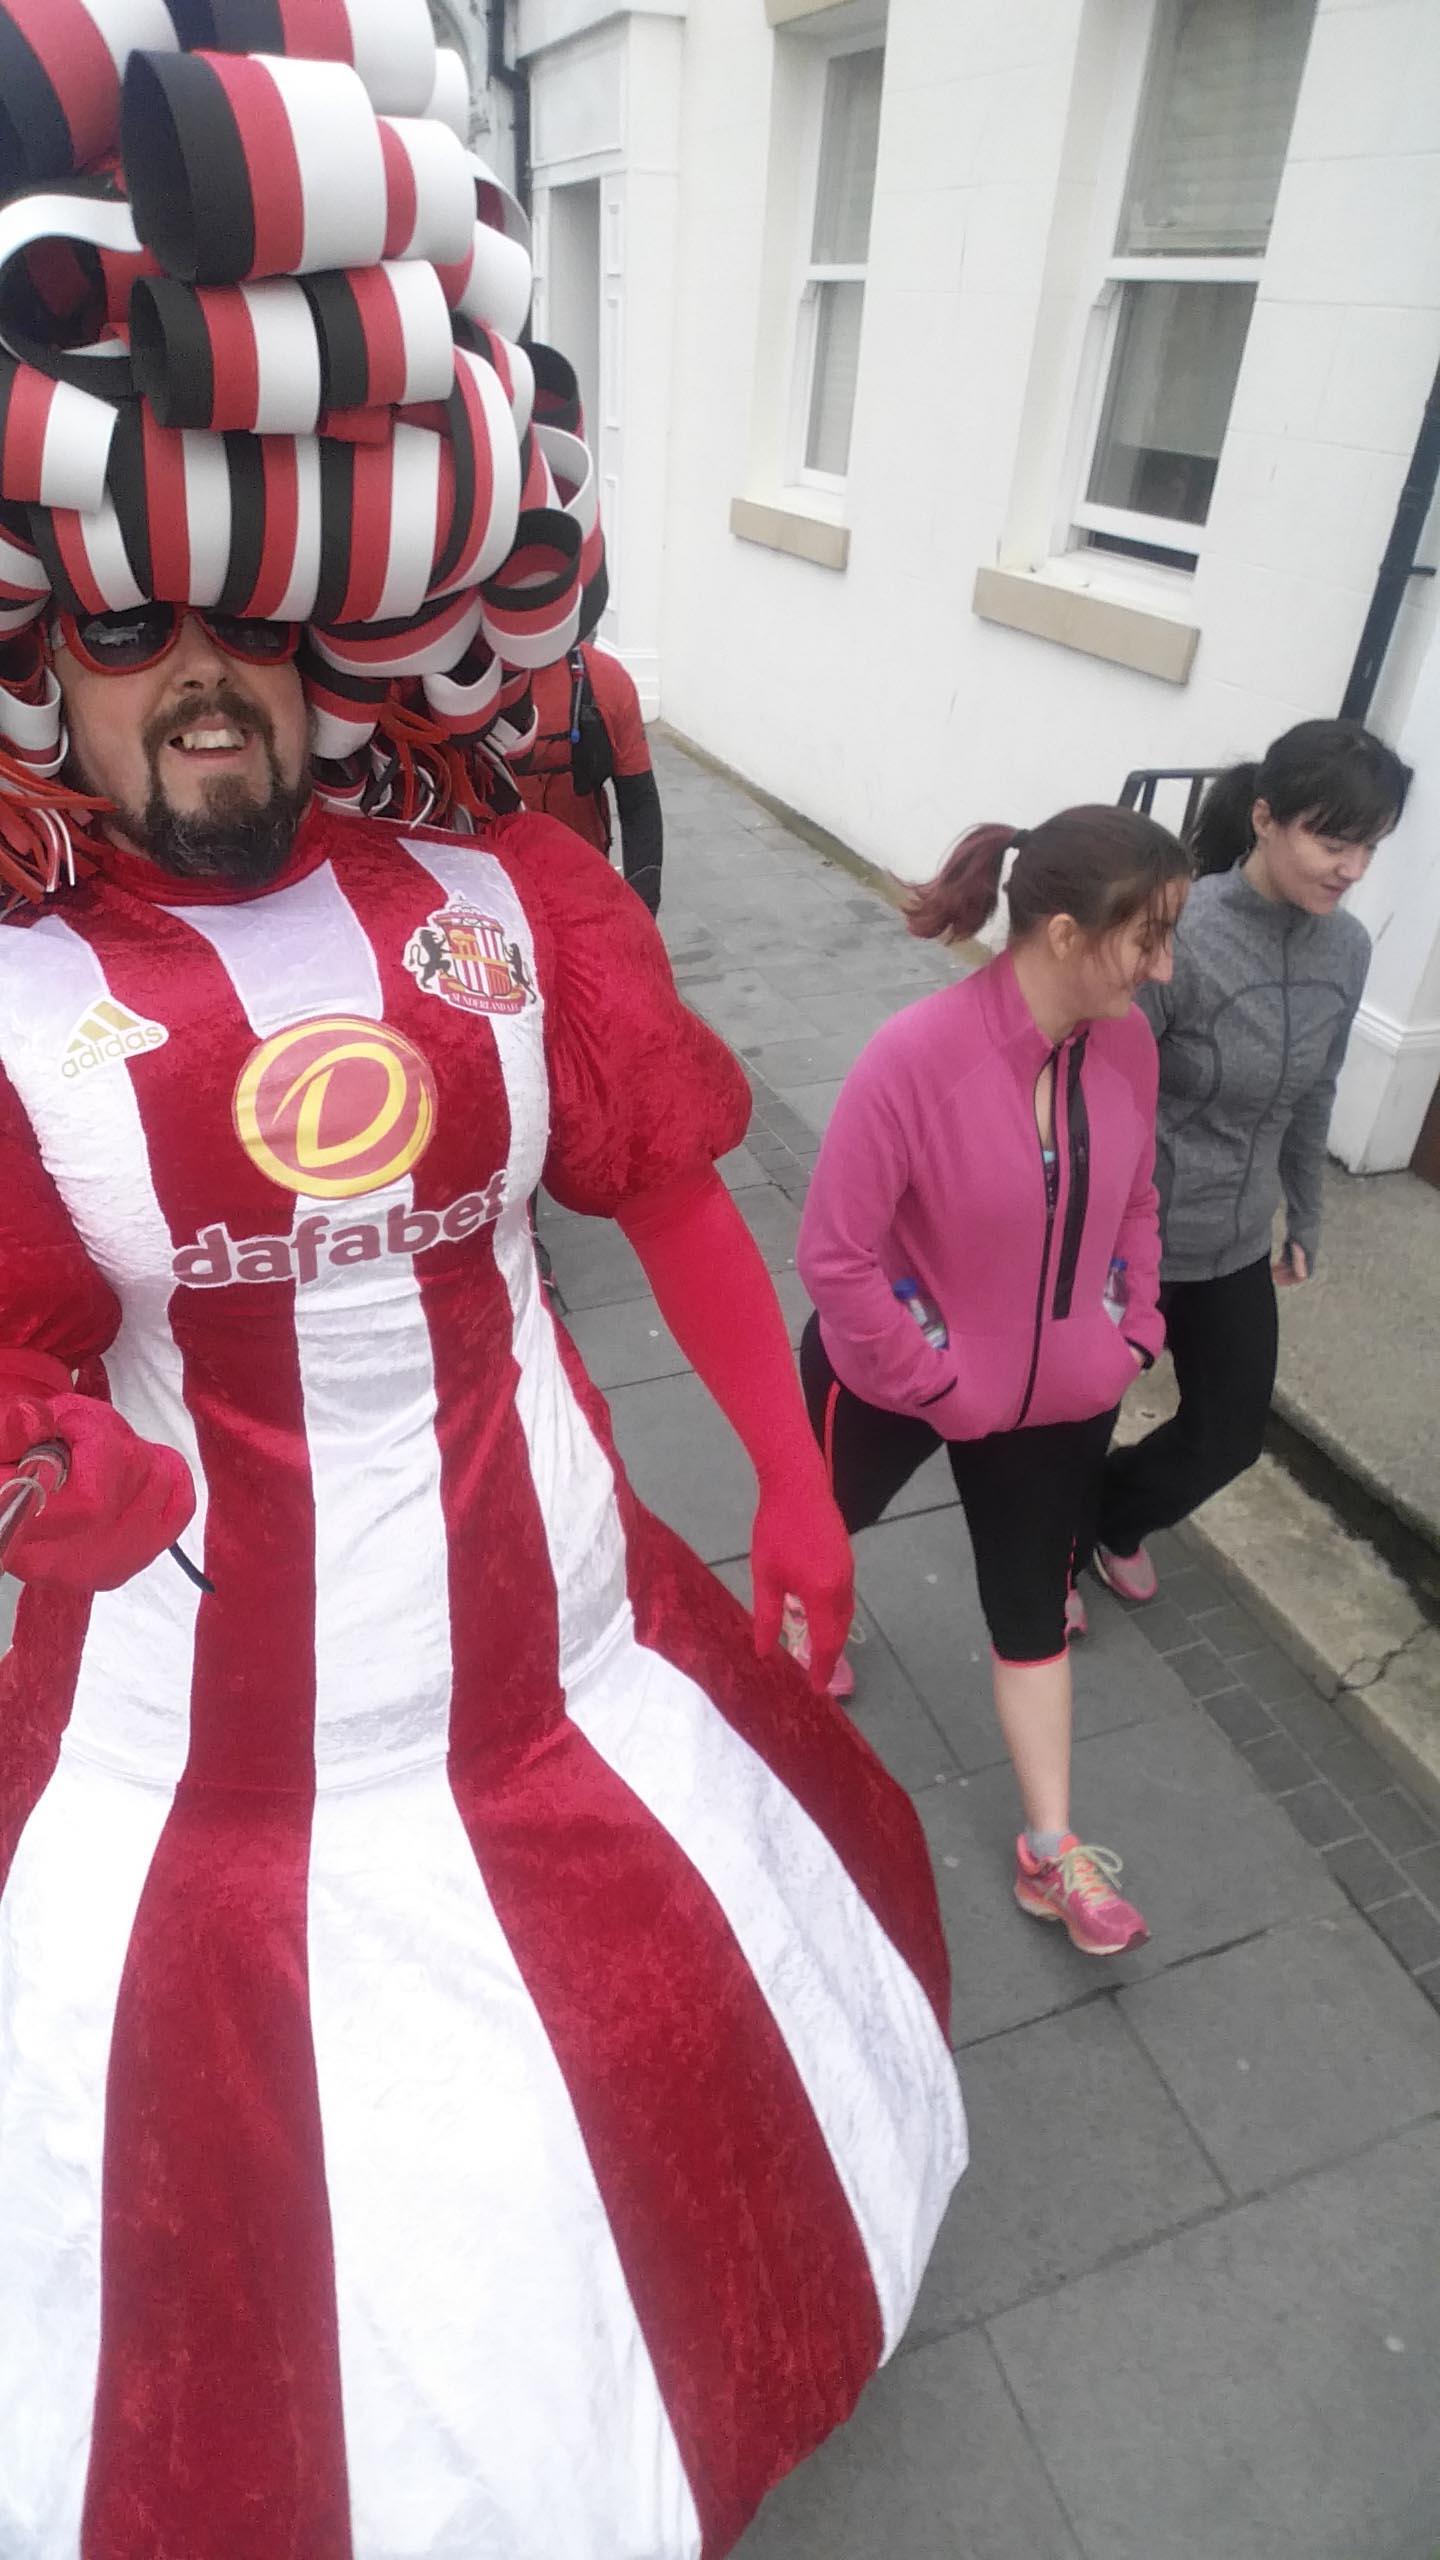 Big-Pink-Dress-THAT-Branding-Company-Sunderland-10km-2017-00006